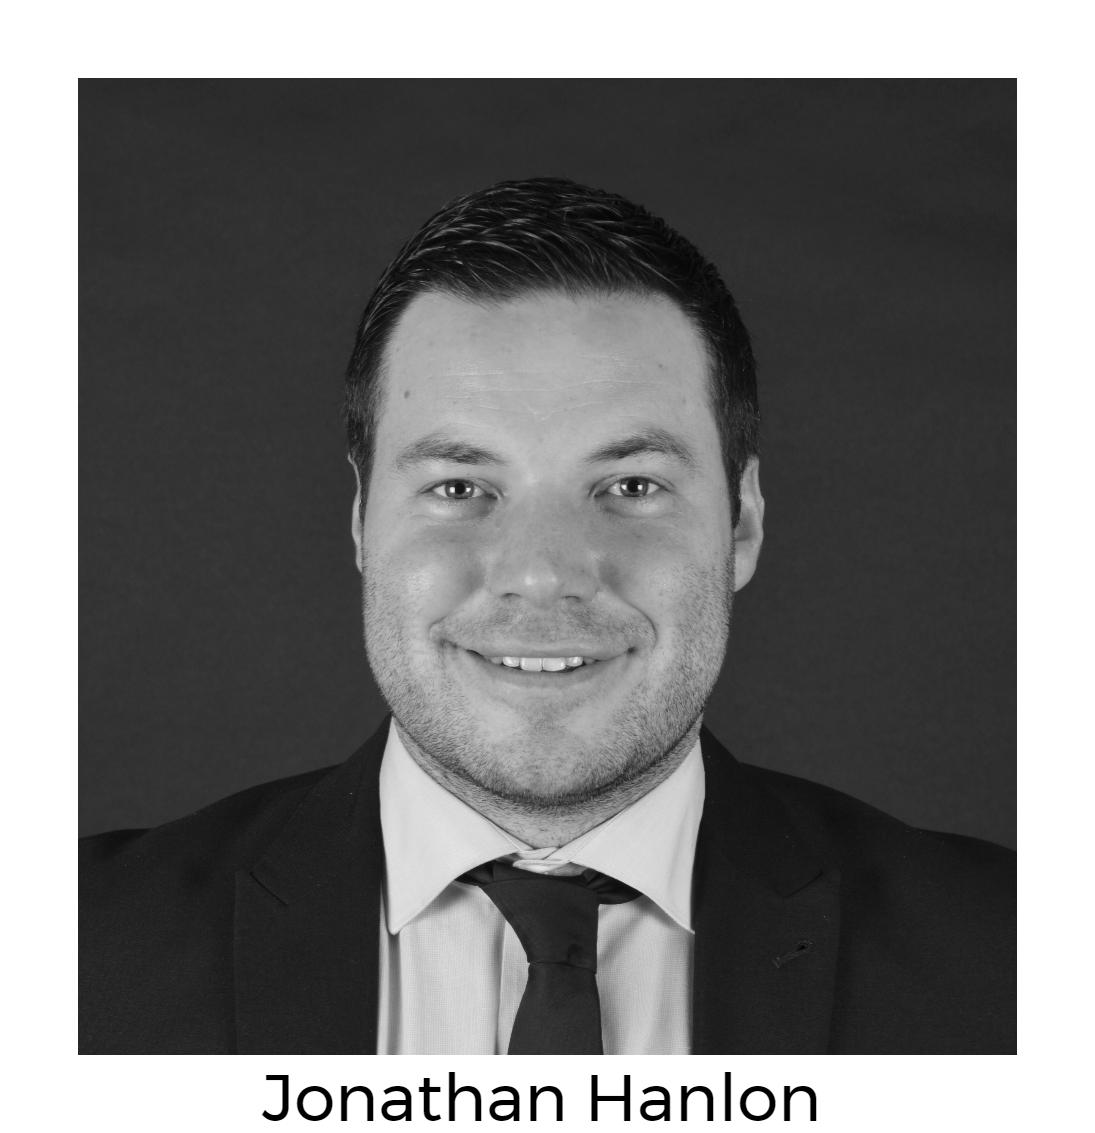 Jonathan Hanlon